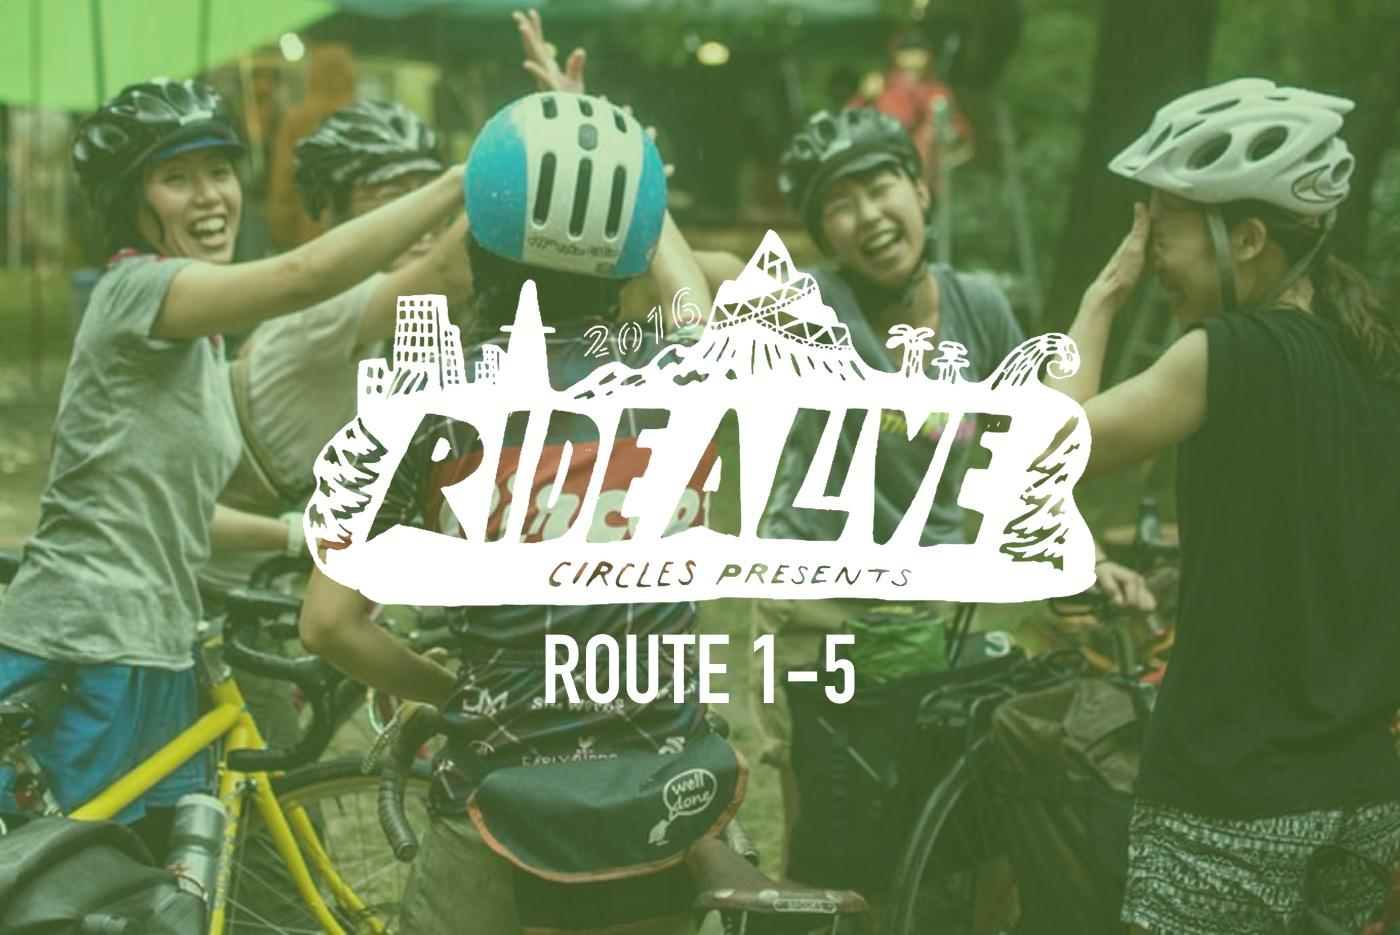 Ridealive2016